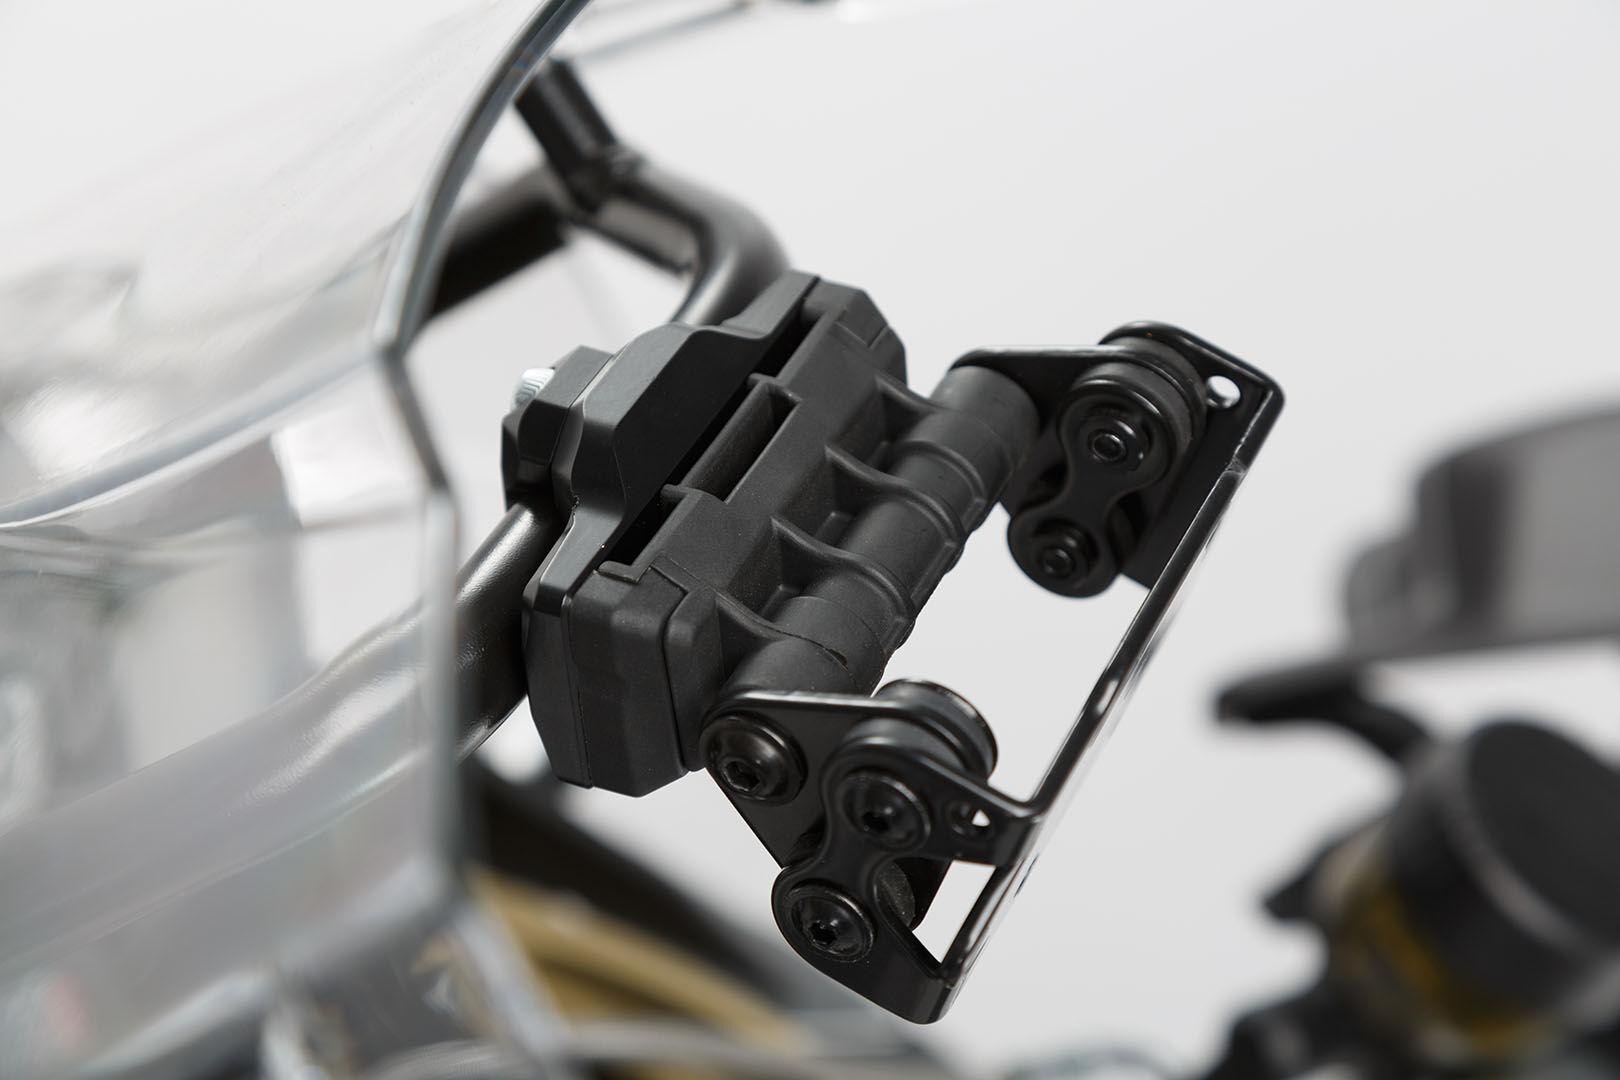 SW-Motech Supporto GPS per traversa Ø 13/16 mm nero